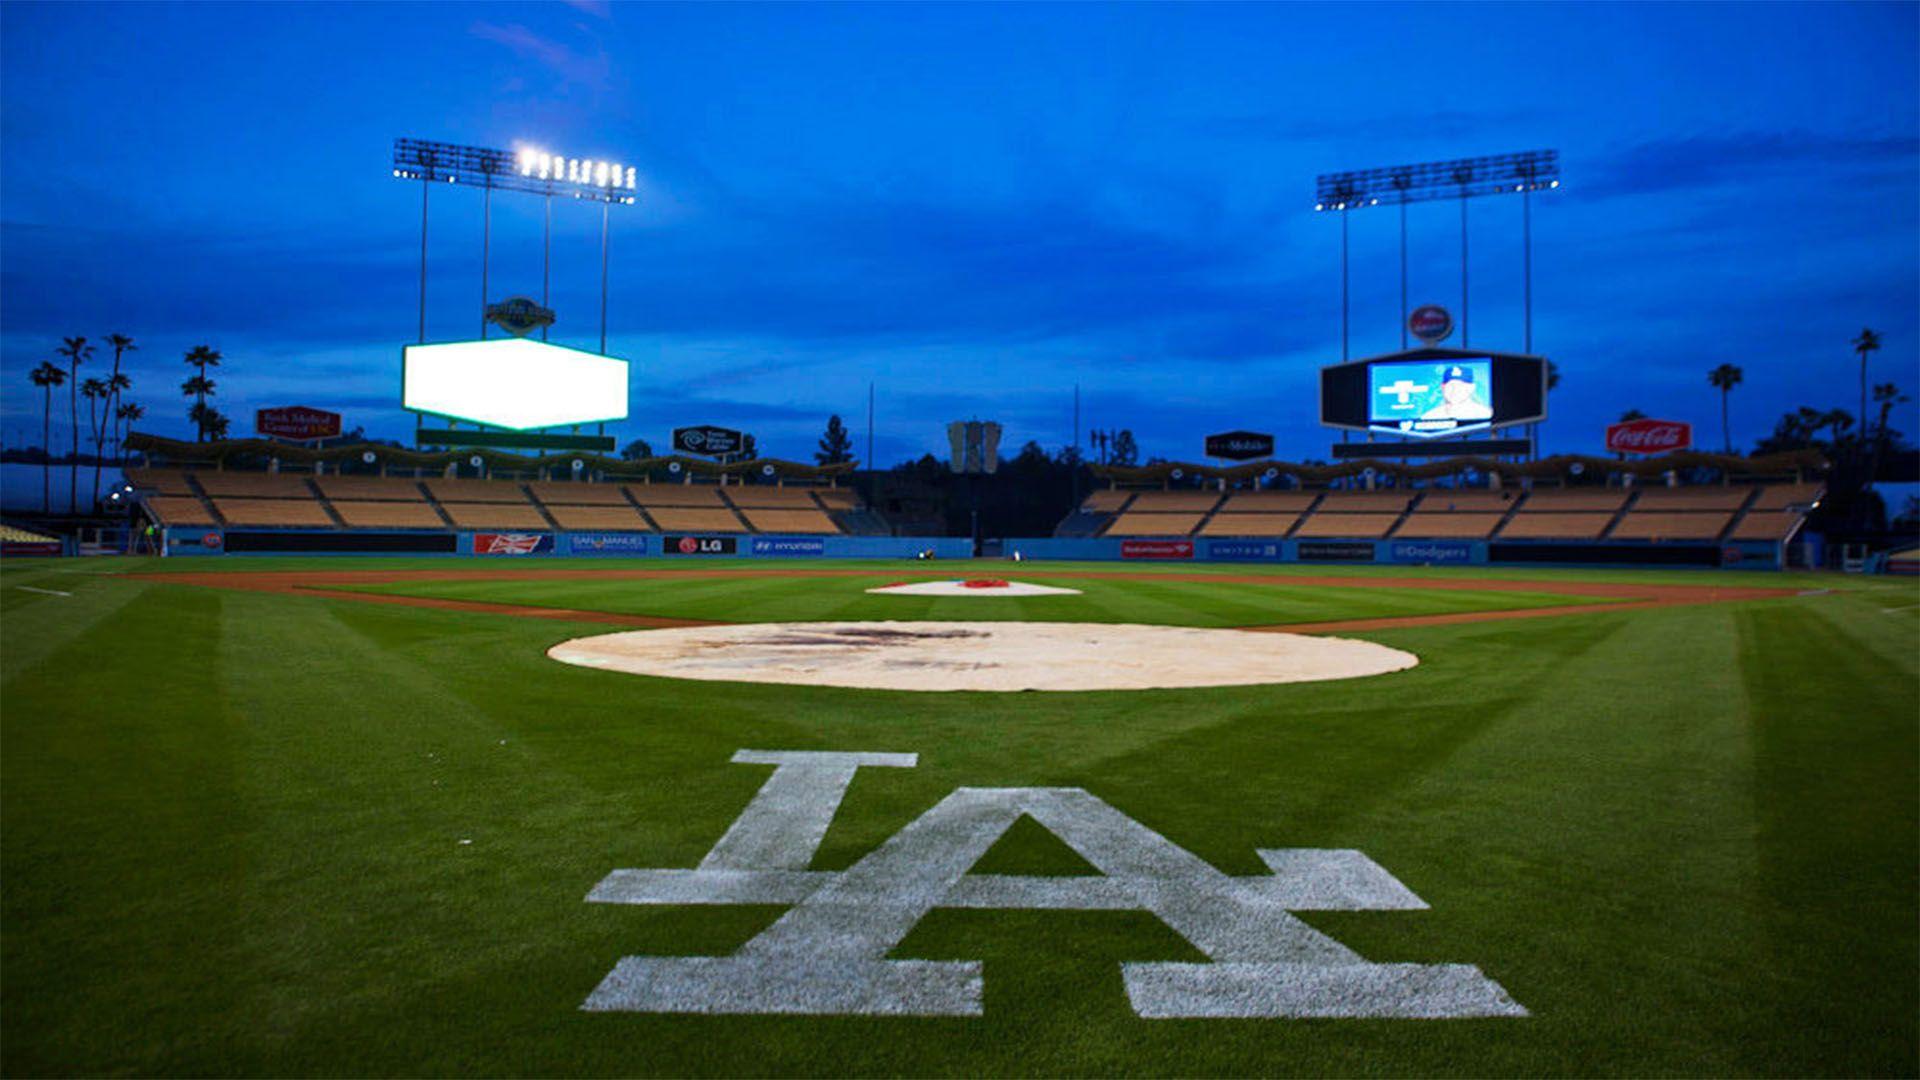 Dodgers pc wallpaper